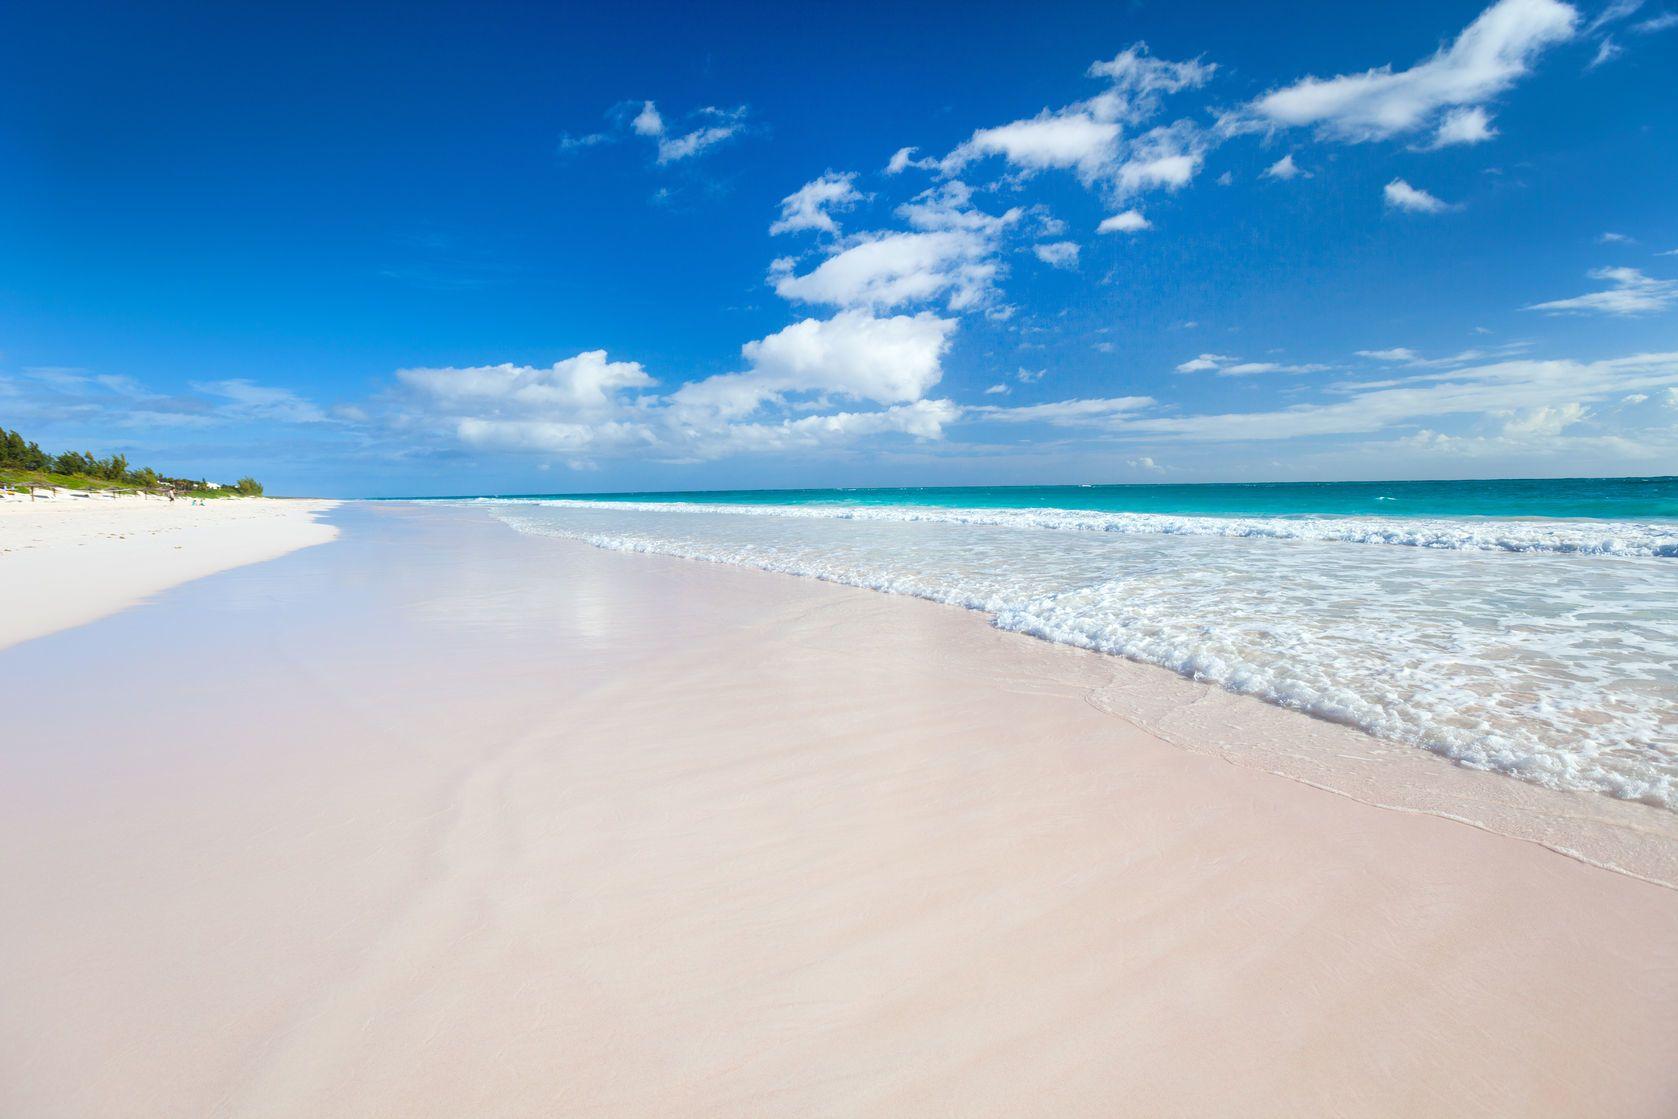 Karibská pláž na Bahamách | shalamov/123RF.com